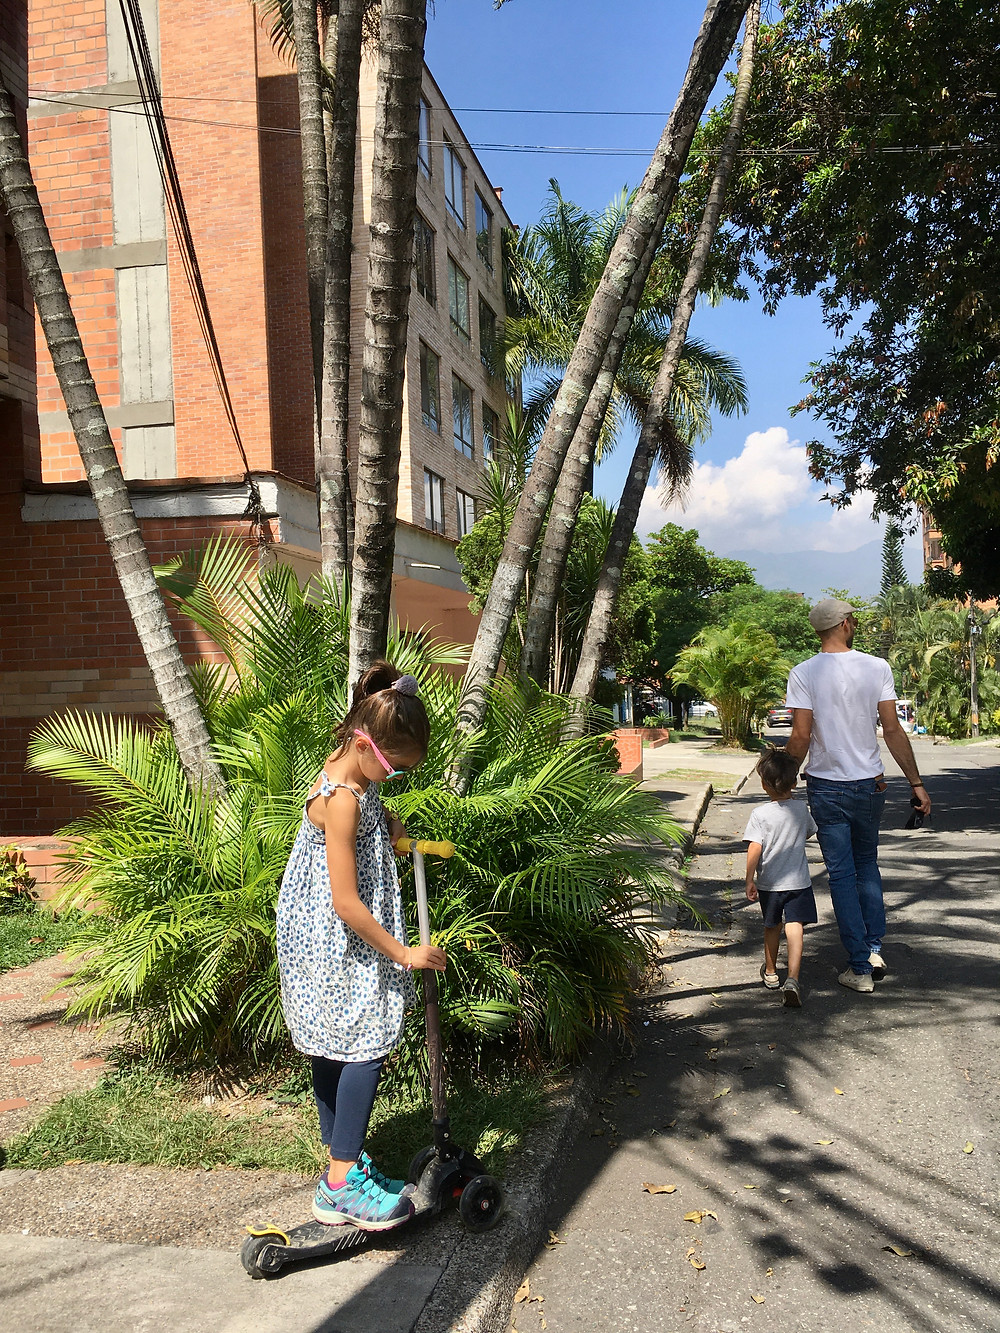 En balade à Medellin